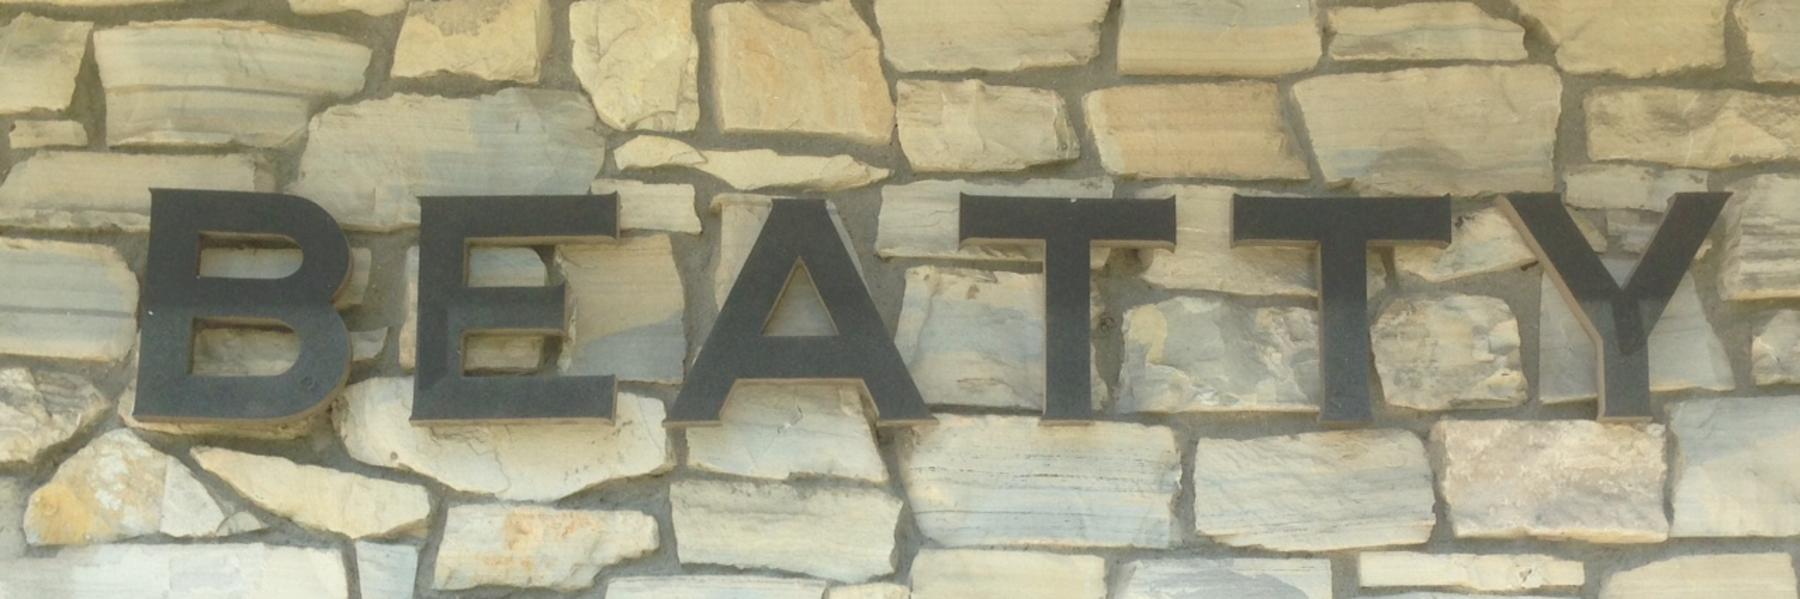 Image of the original Beatty metal signage